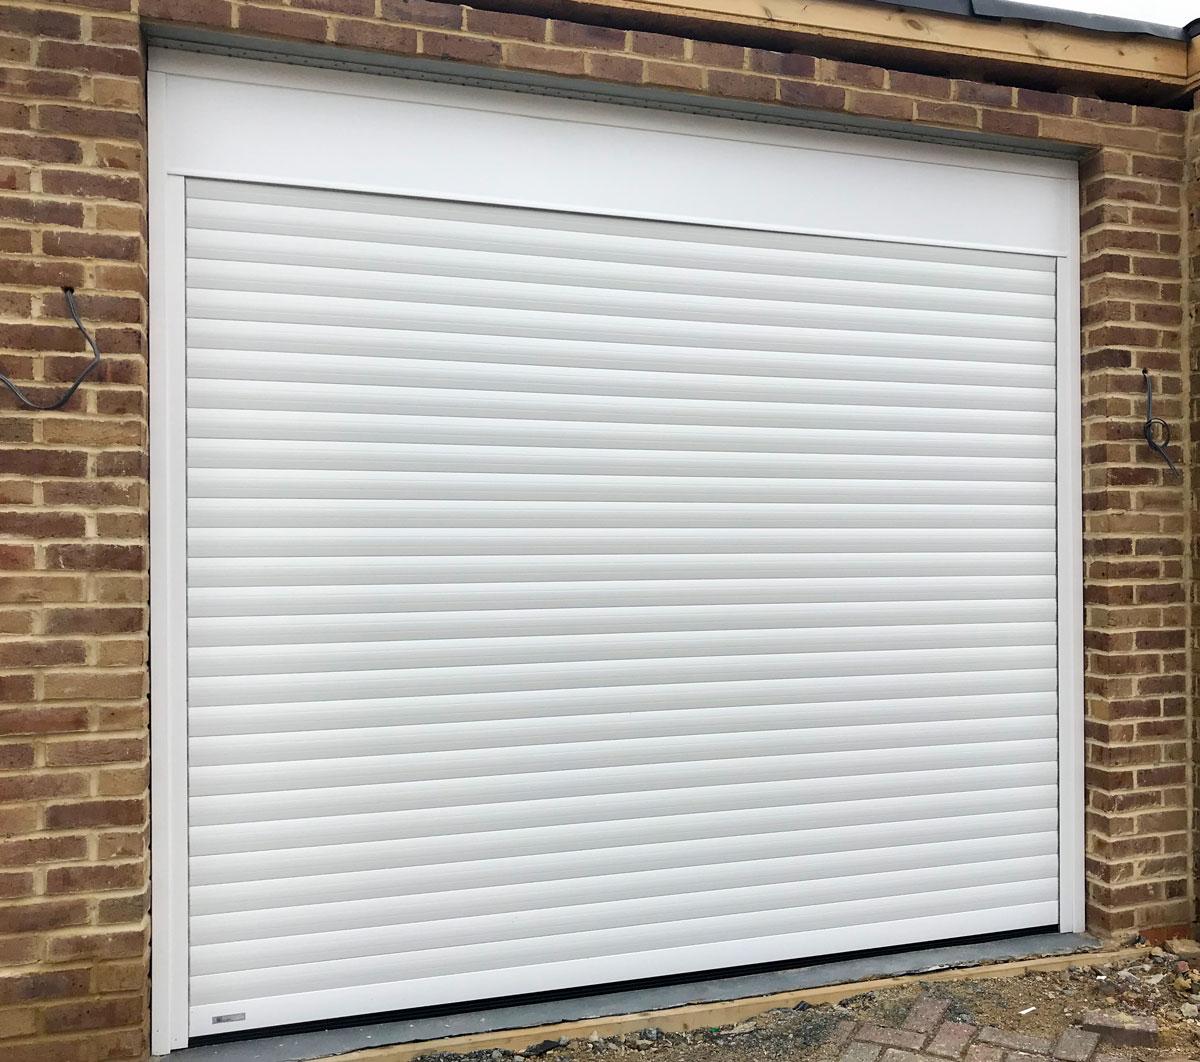 An SWS SeceuroGlide Classic Roller Garage Door in White